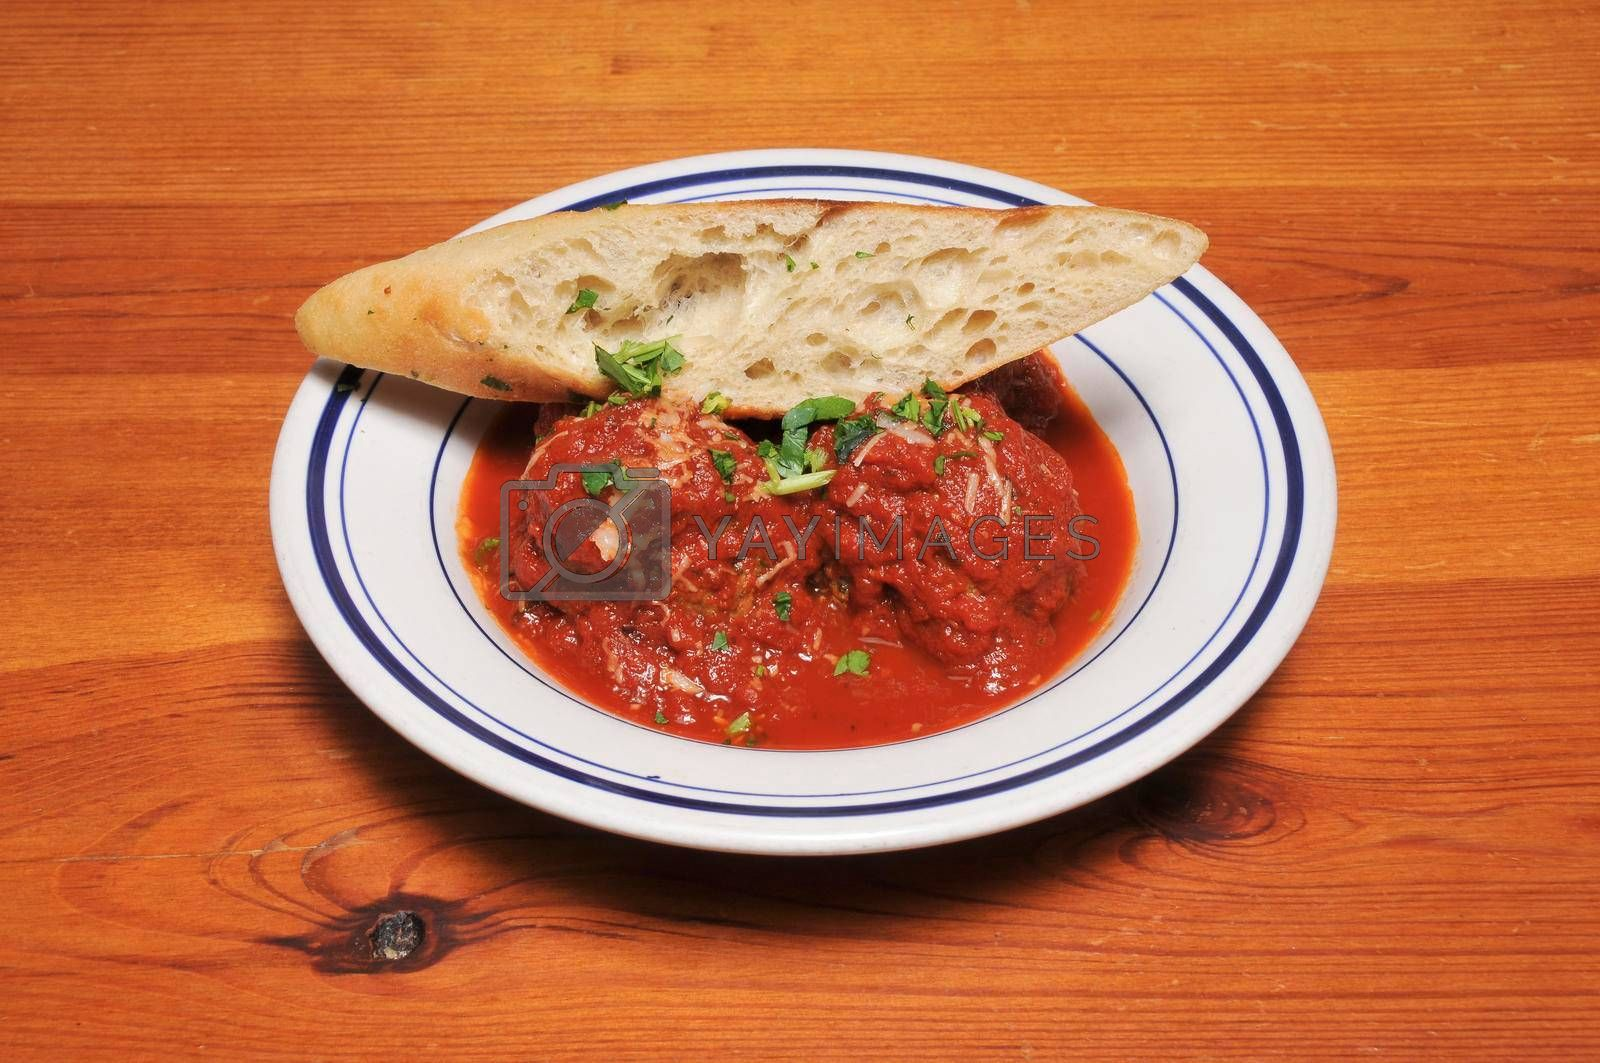 Authentic Italian cuisine known as a meatballs